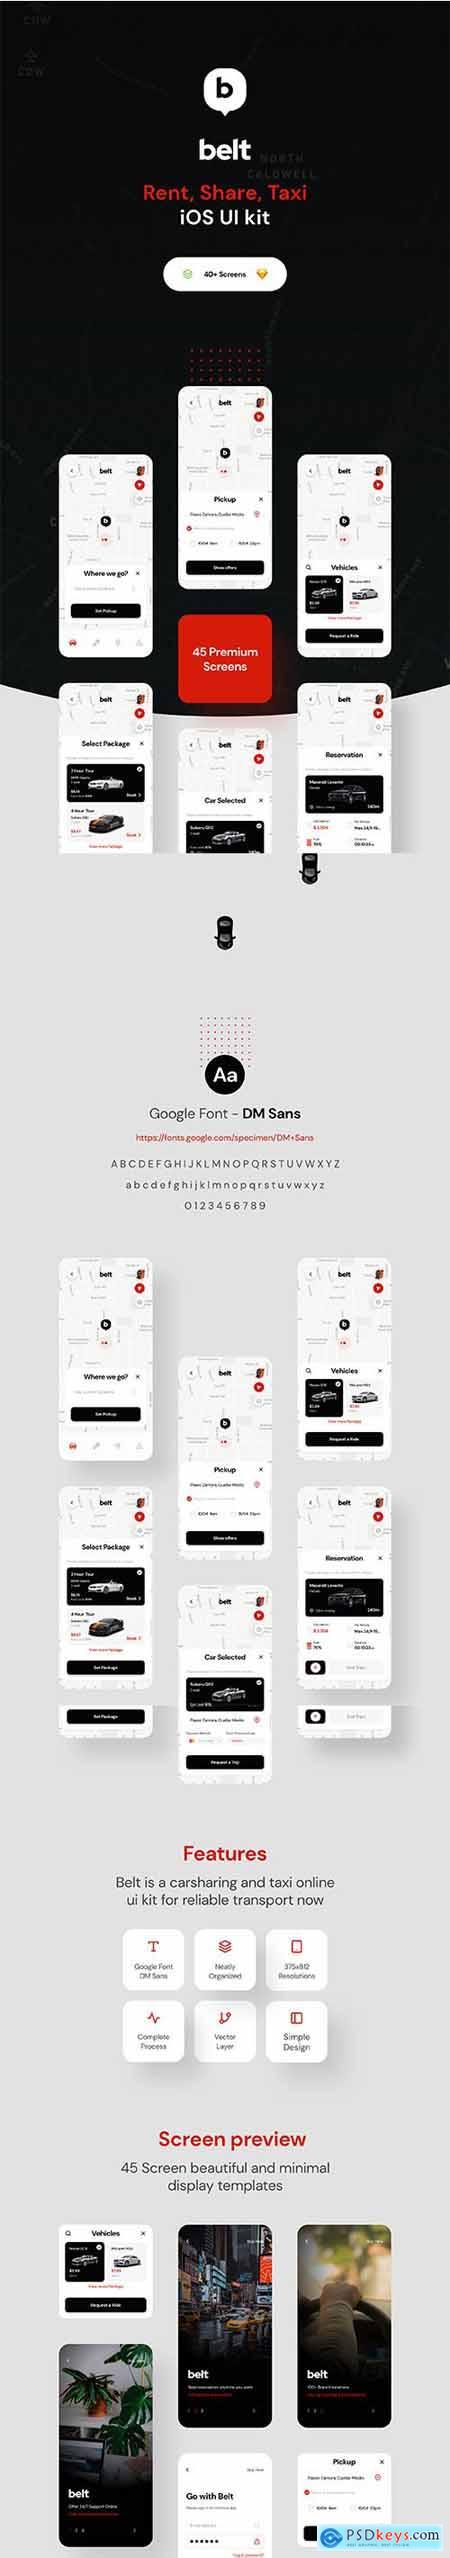 Belt App UI kit